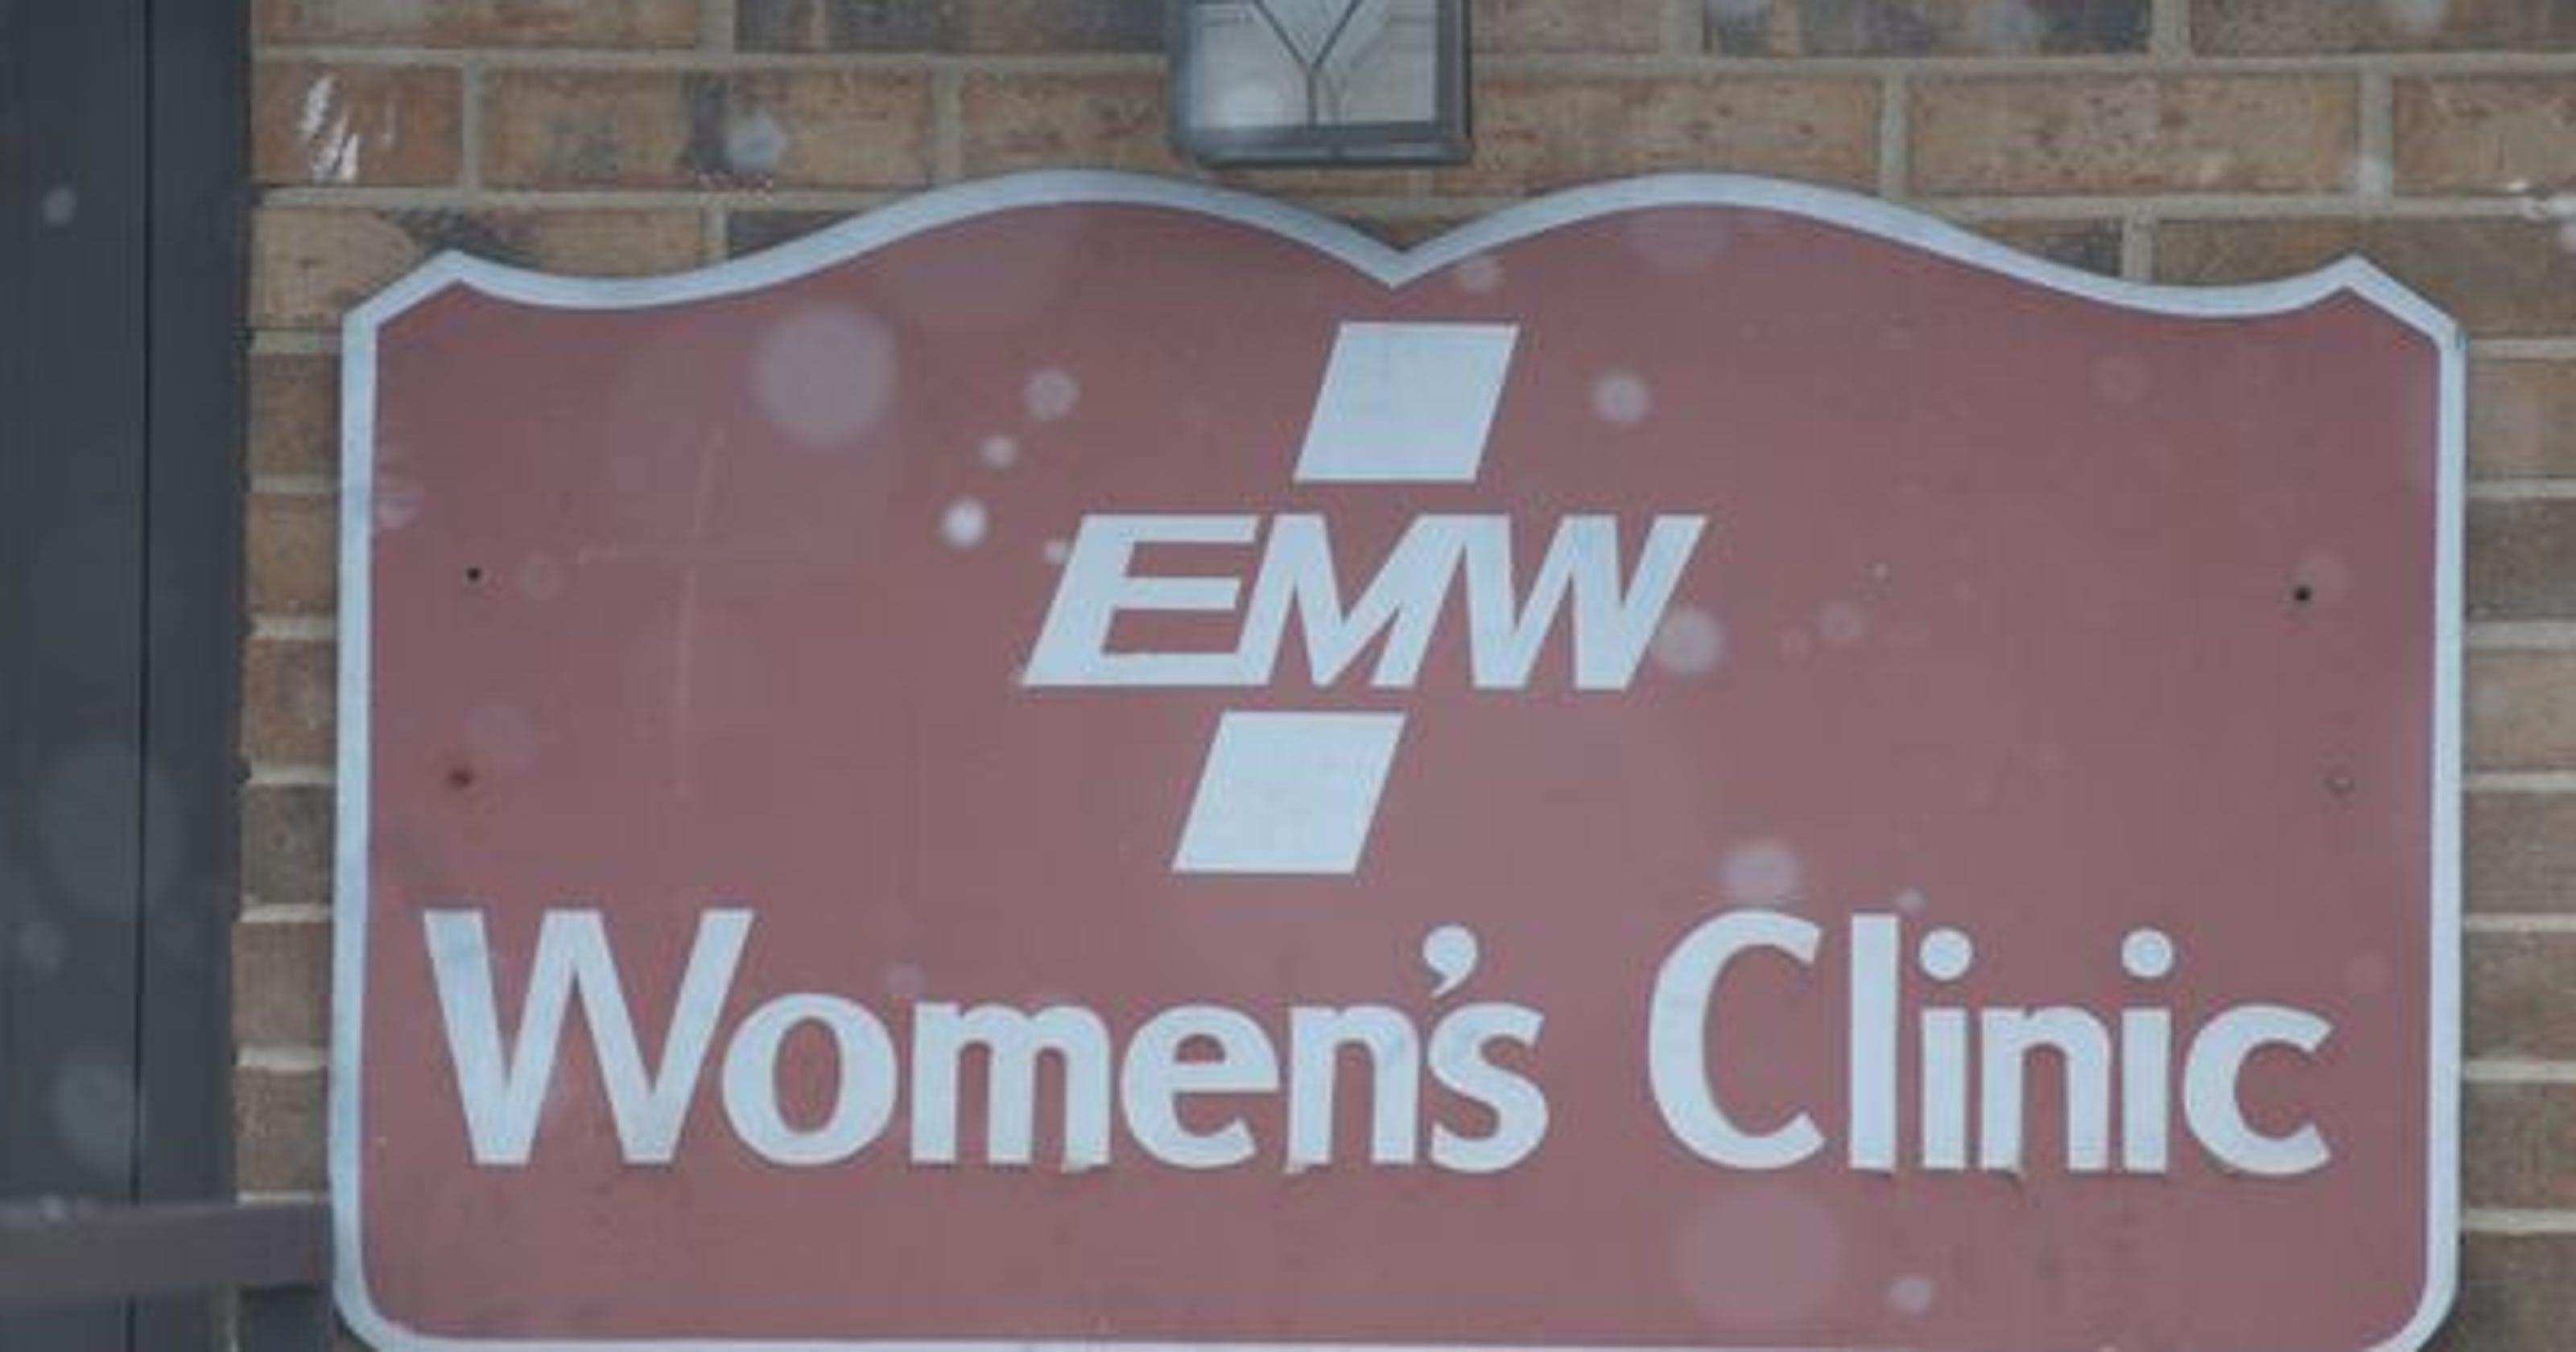 Kentucky Abortion Clinics - find abortion clinics near me ...